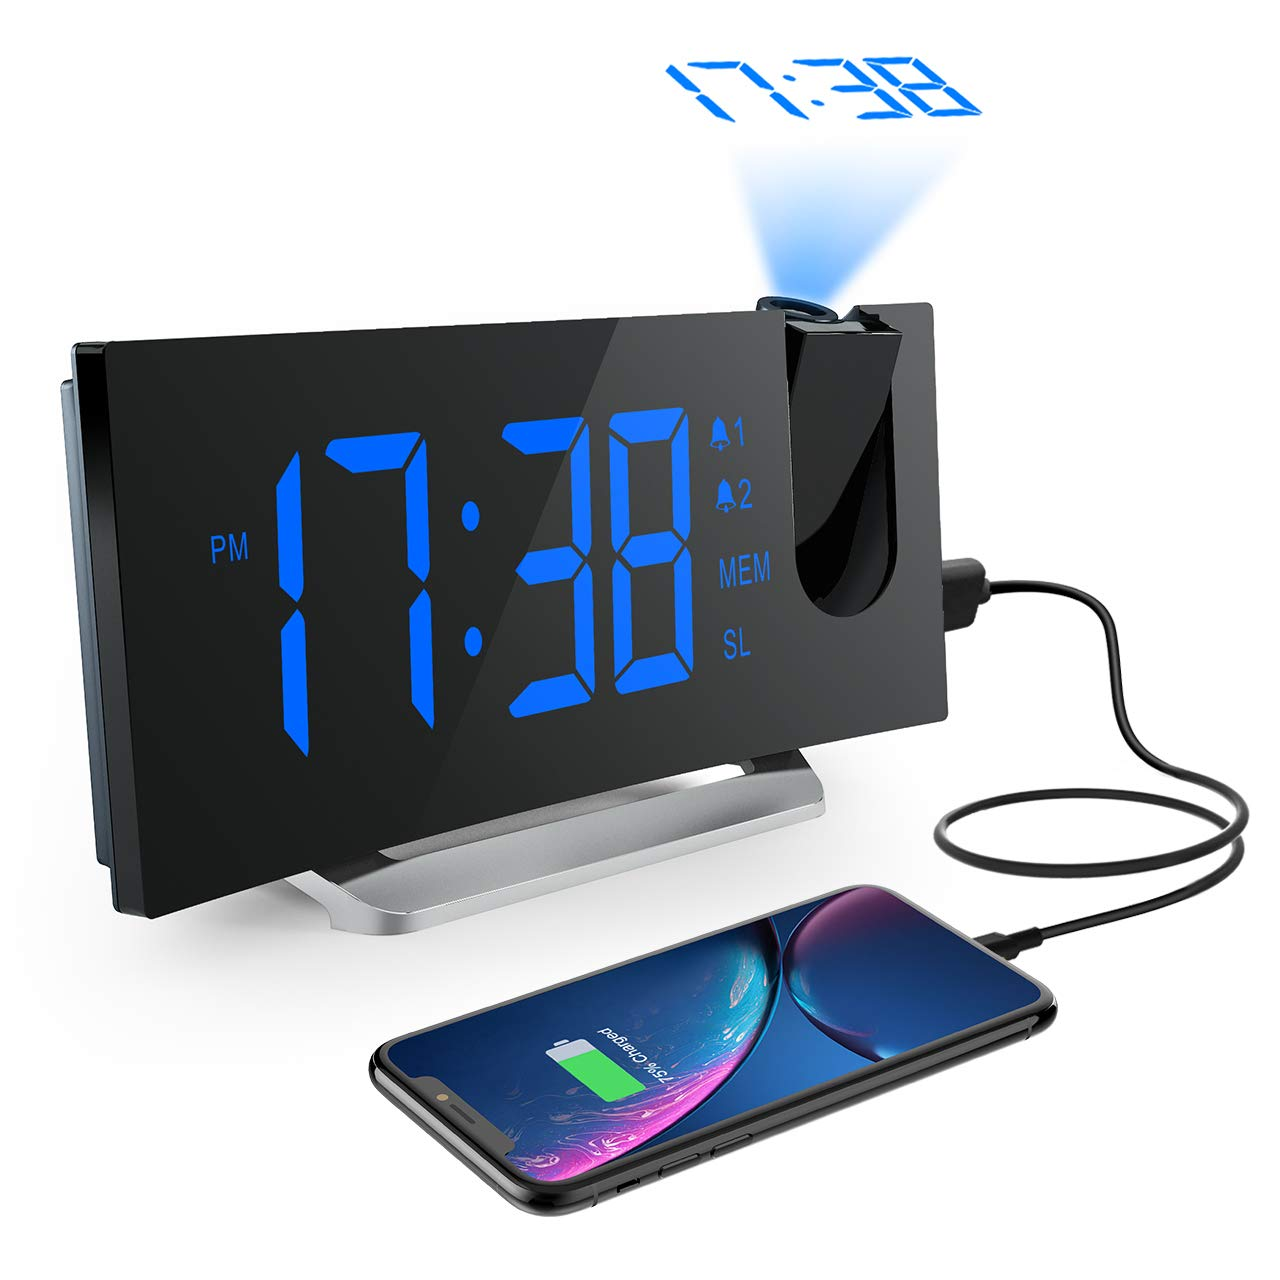 Radio Despertador Digital Proyector, Mpow FM Radio Reloj Despertadores Digitales de Proyección, Alarma Dual